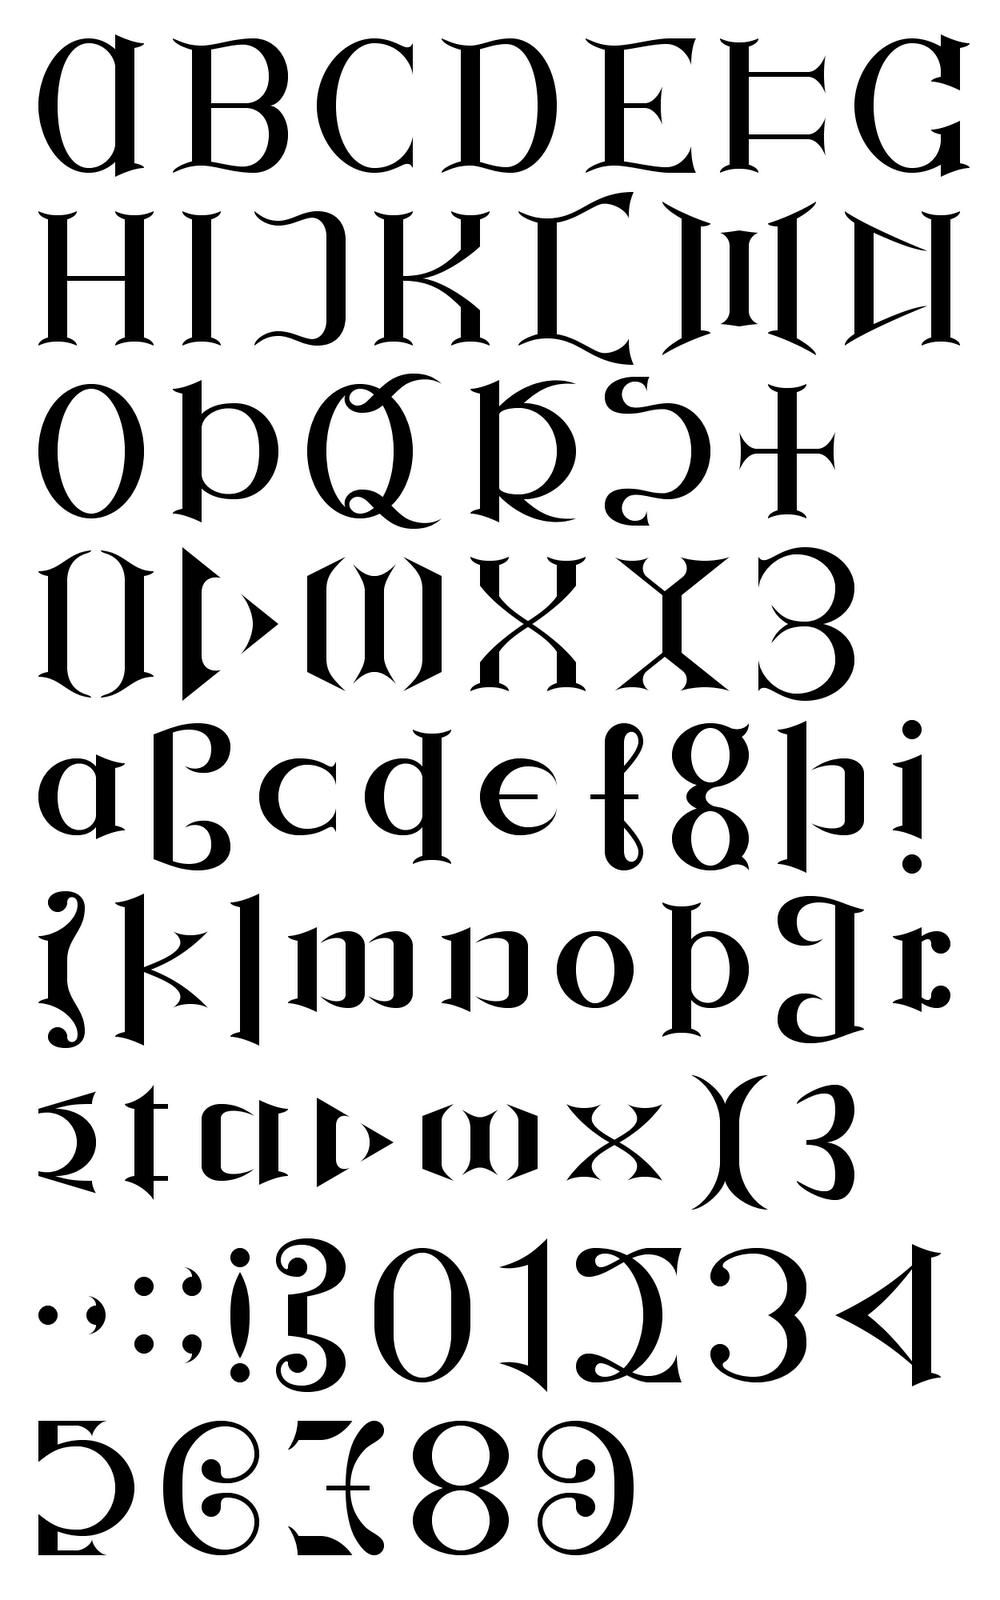 Free Online Font Generator Tattoos: Ambigram, Tattoo Fonts, Ambigram Tattoo